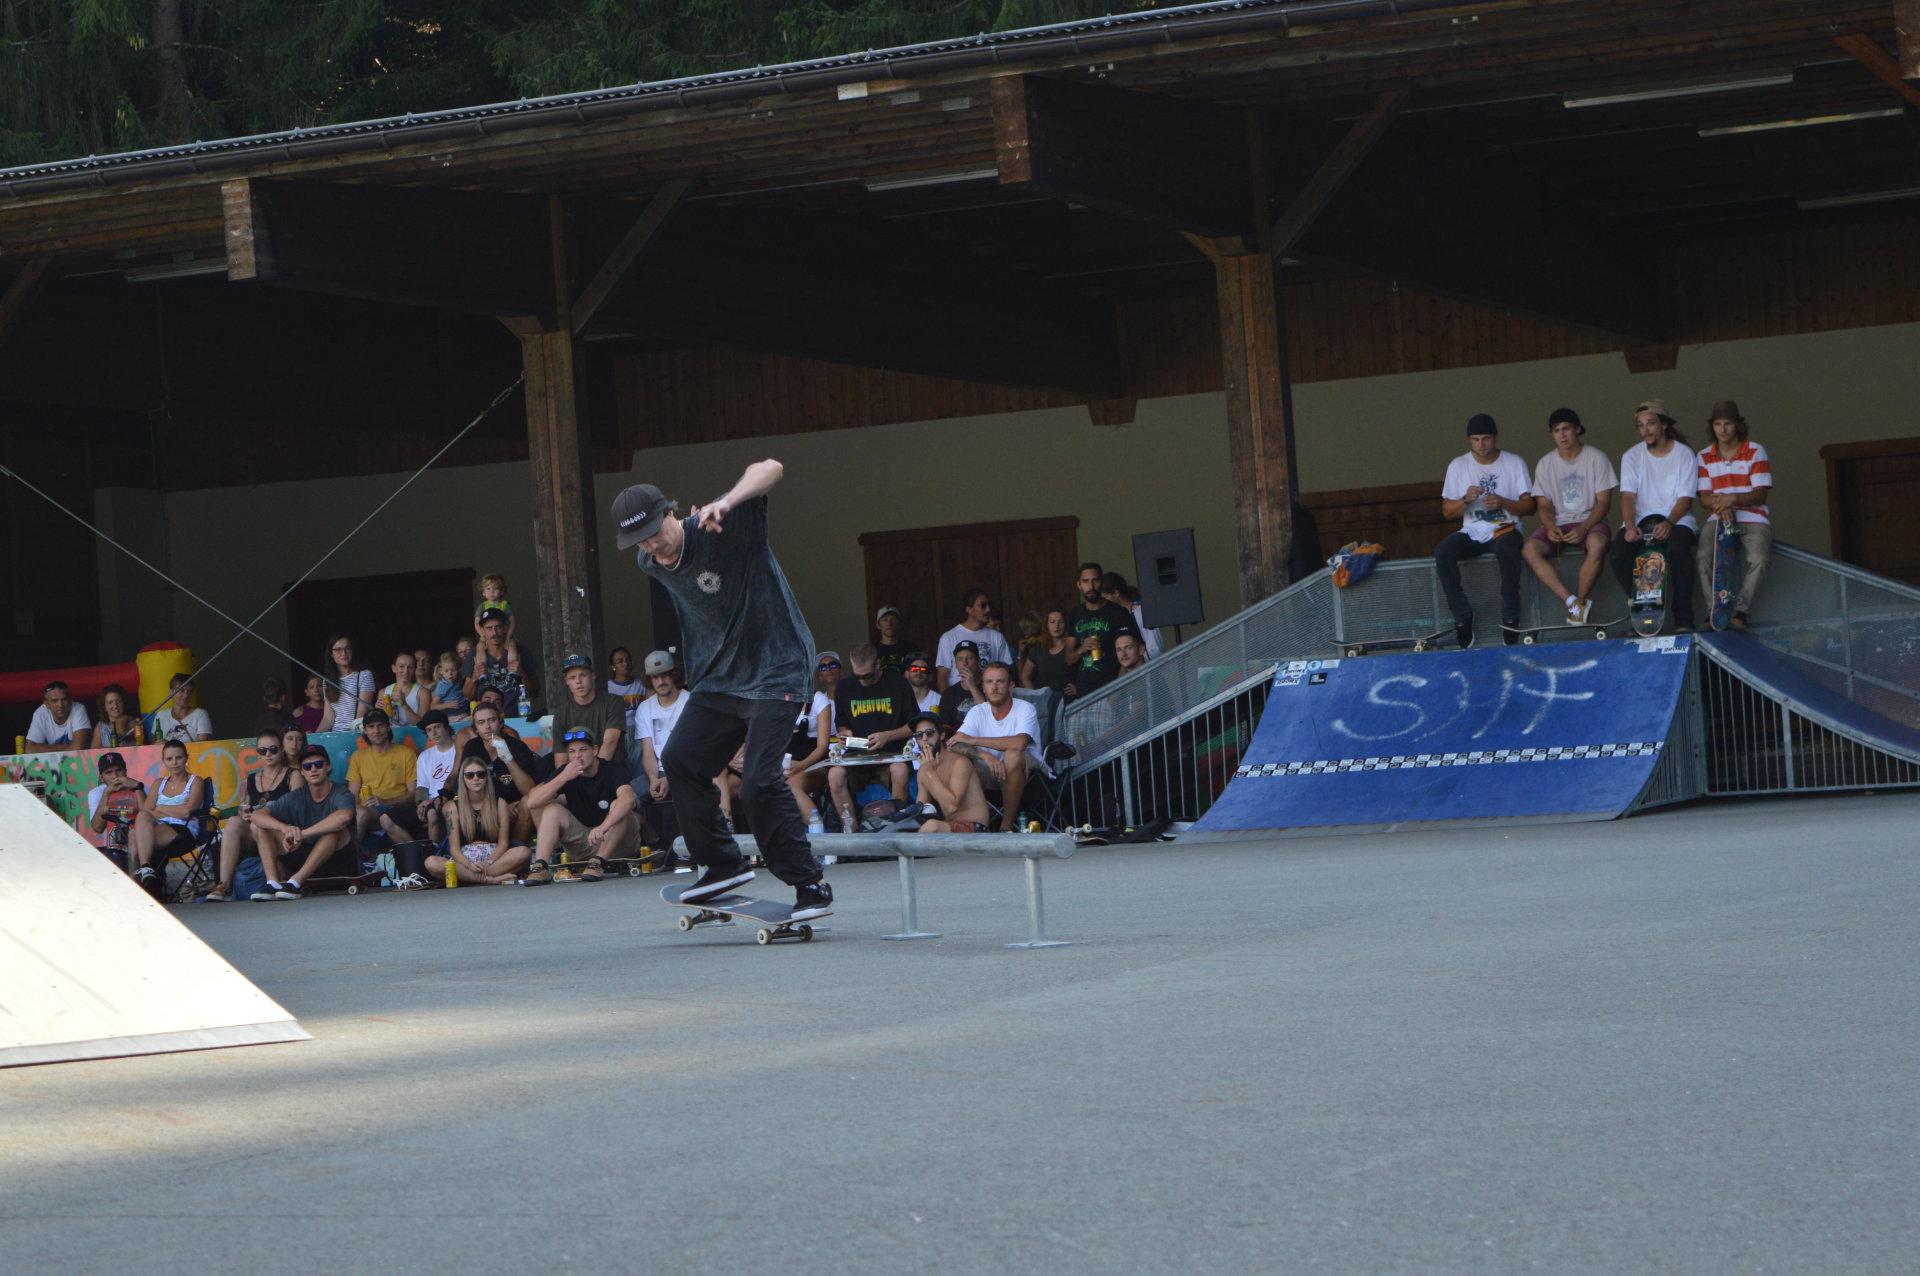 skateboardheadz fieberbrunn kitzgau trophy finale 2018 fieberbrunn 00104